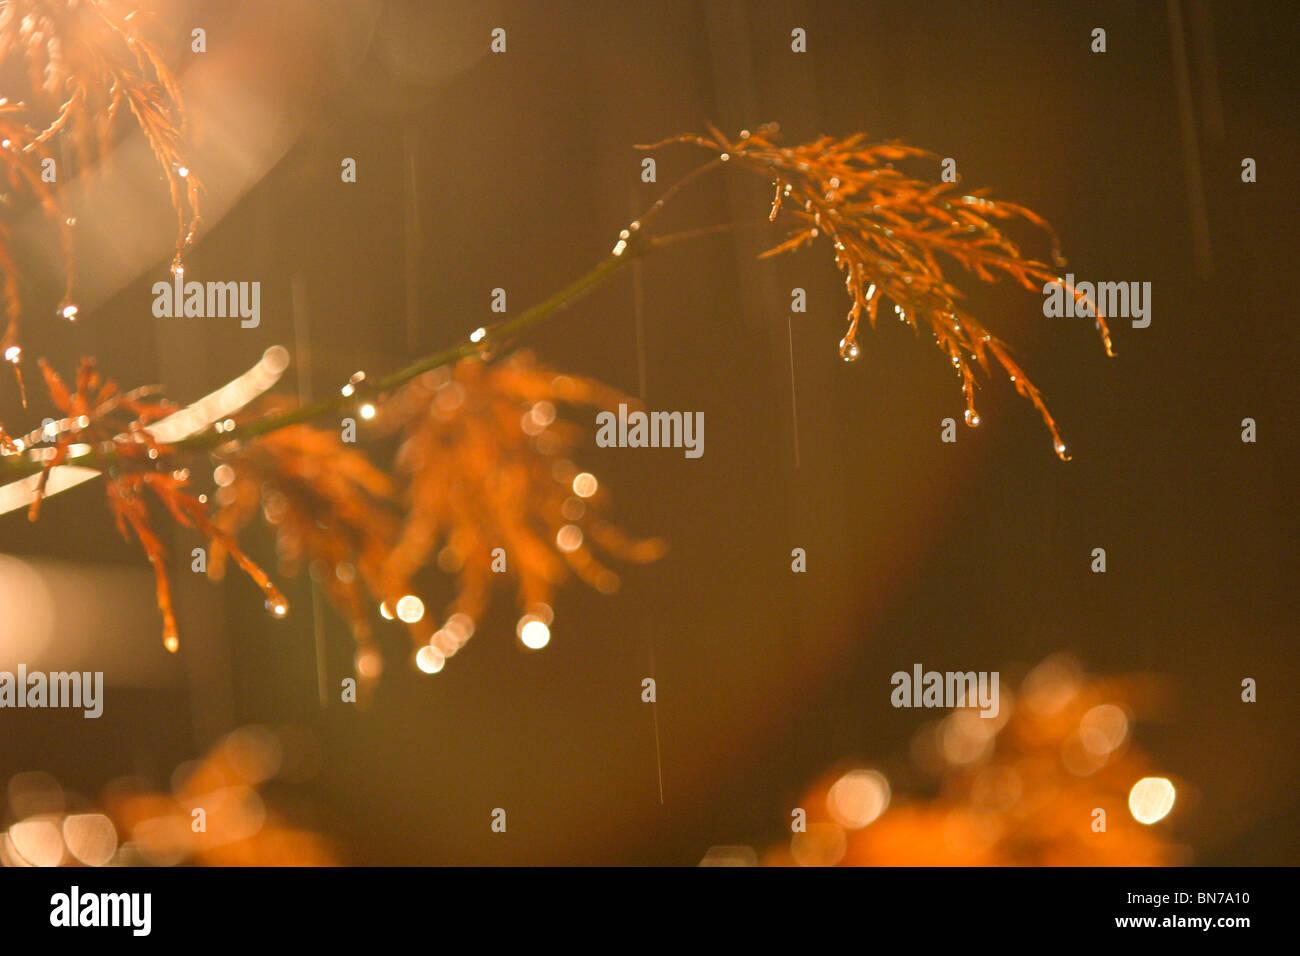 rain drops falling on orange Japanese maple tree leaves, at night. - Stock Image